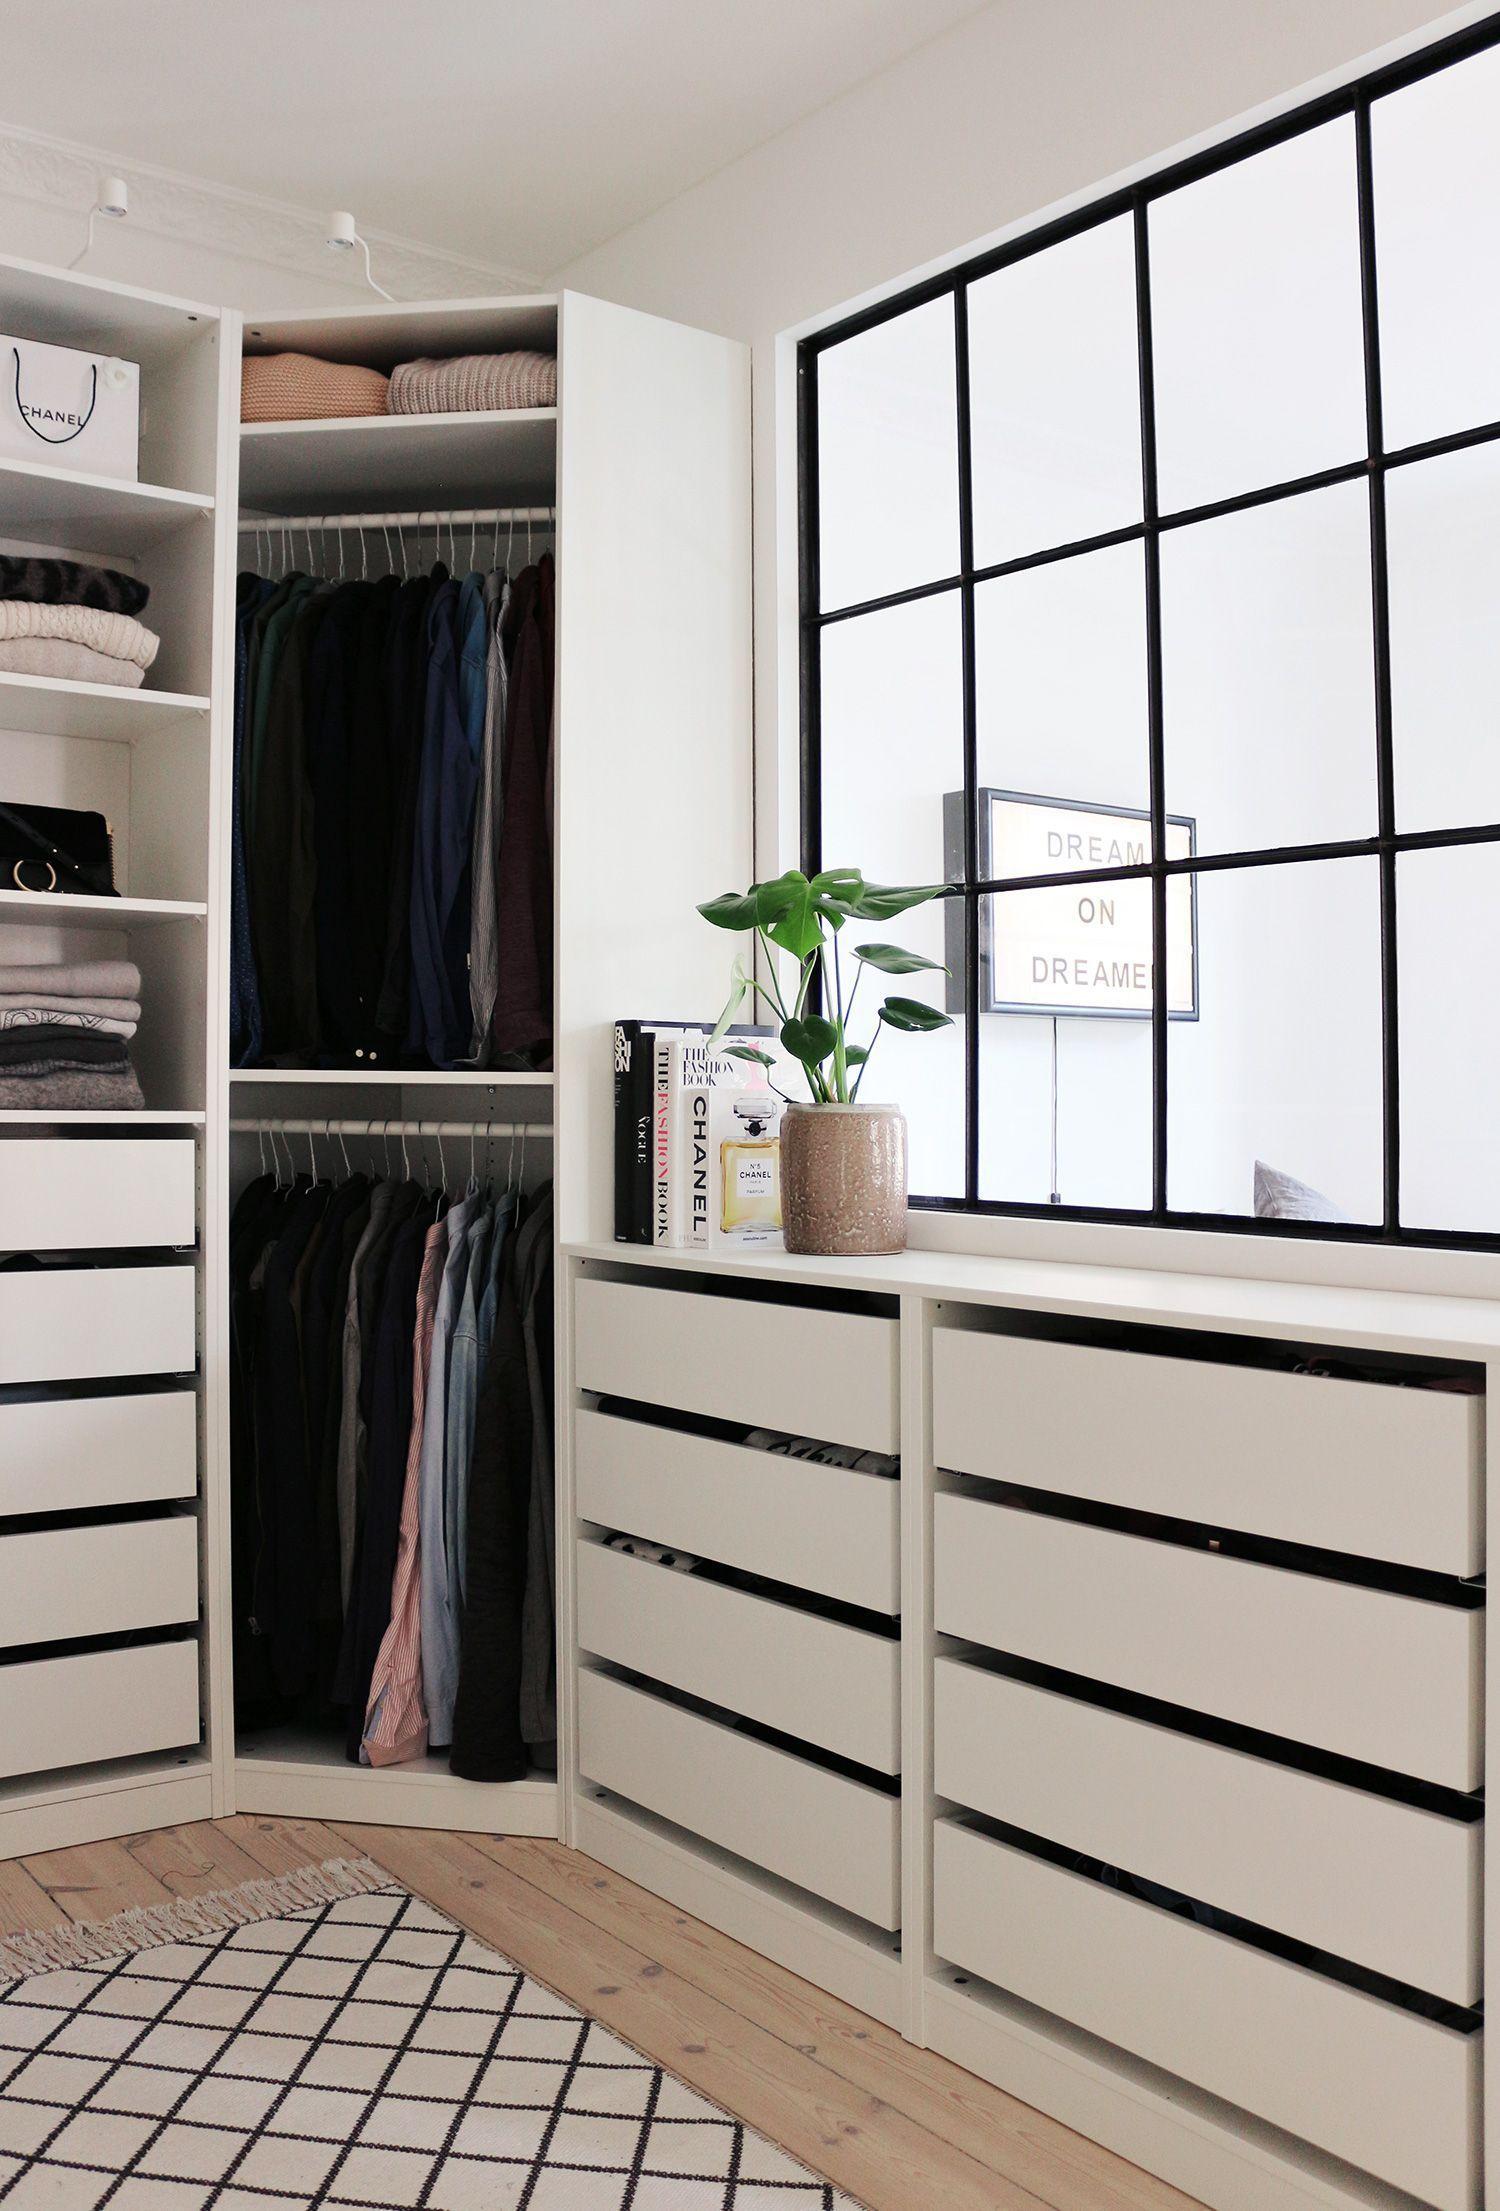 Diy Ikea Metod Schuhschrank Begehbarer Kleiderschrank